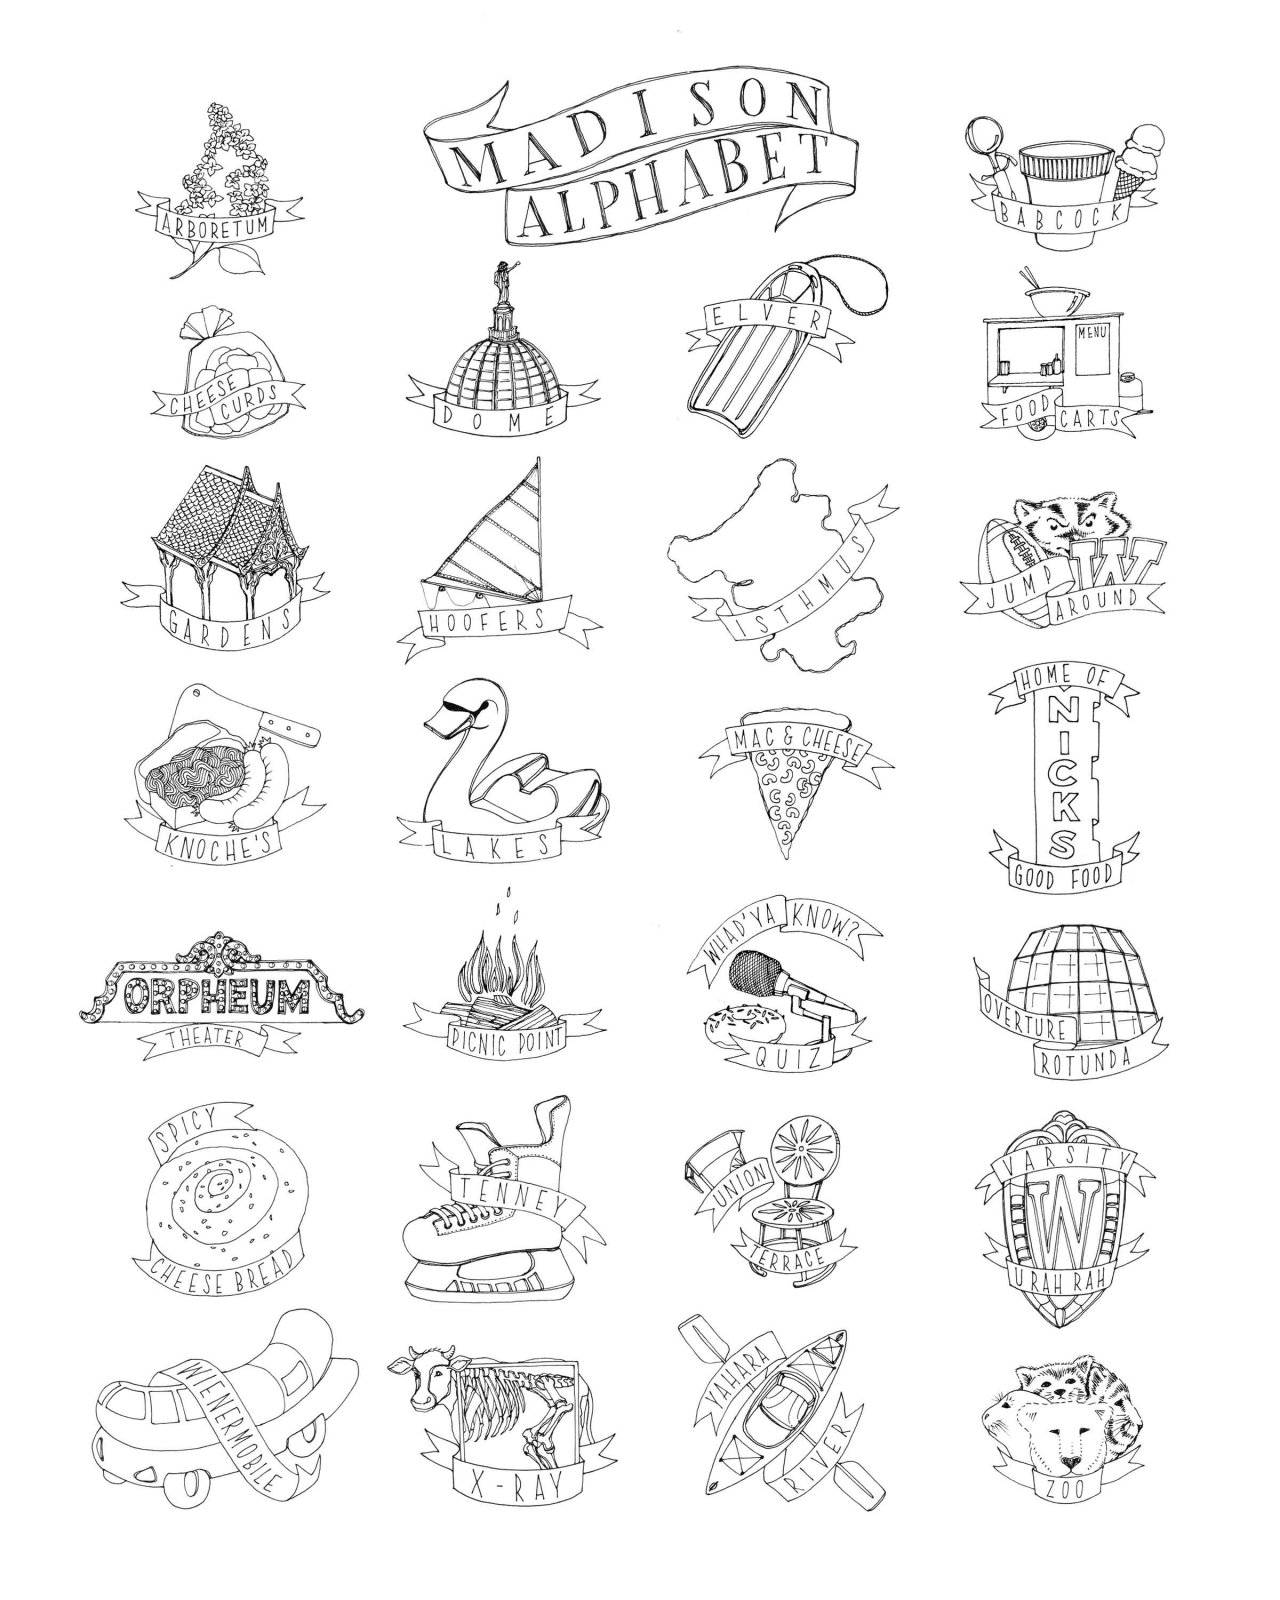 Madison Alphabet Print